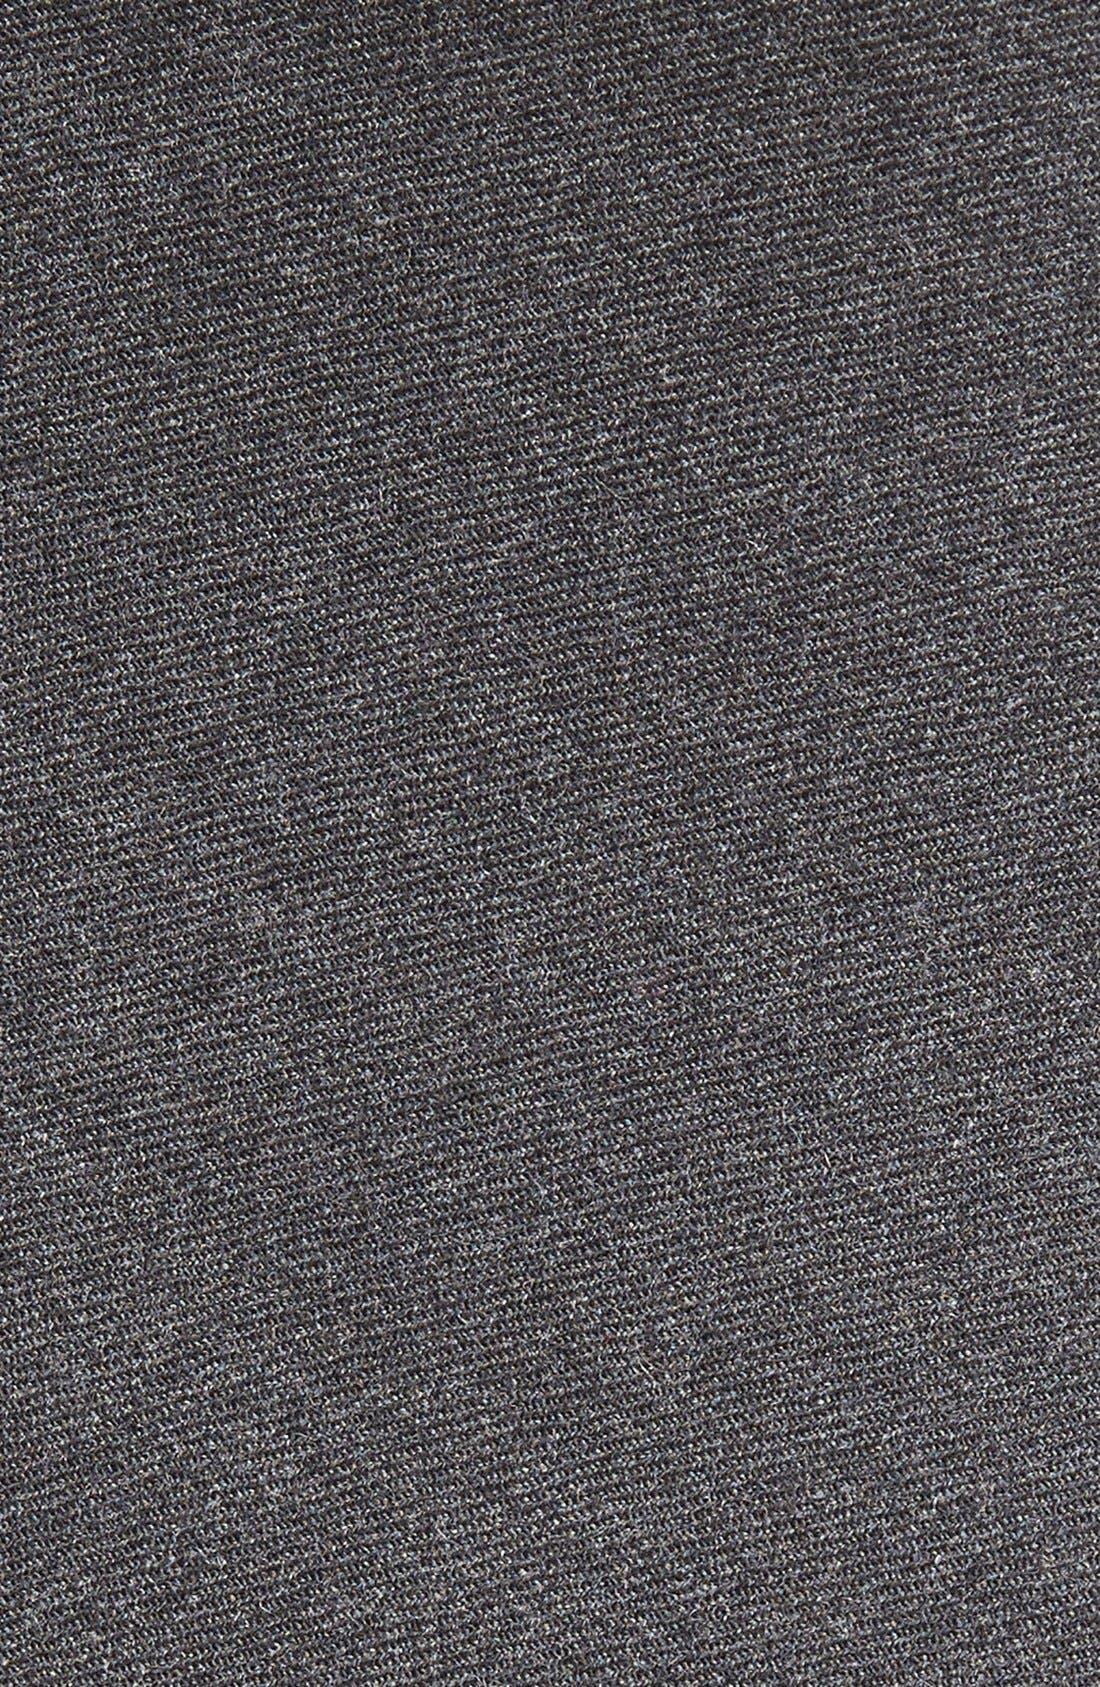 Alternate Image 5  - Eileen Fisher Wool Twill Sarong Pants  (Regular & Petite)